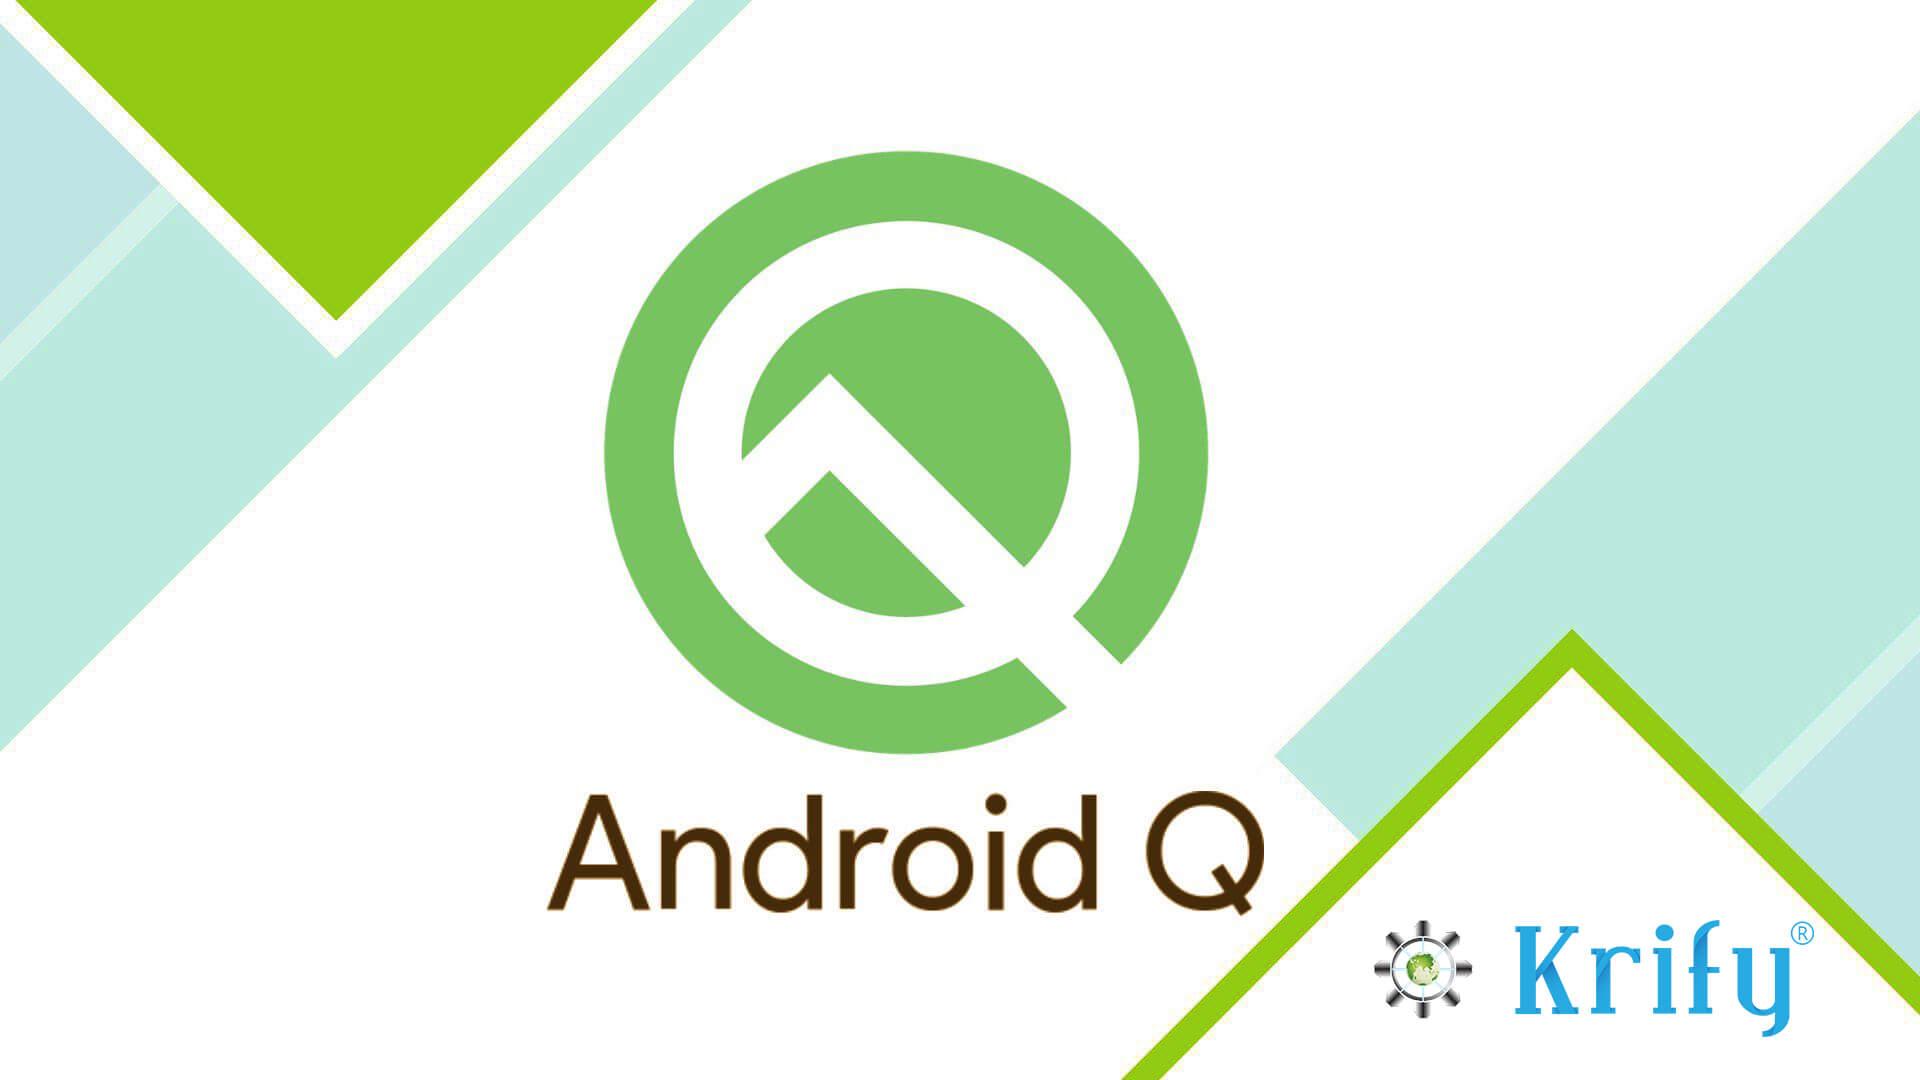 Logo Android Q